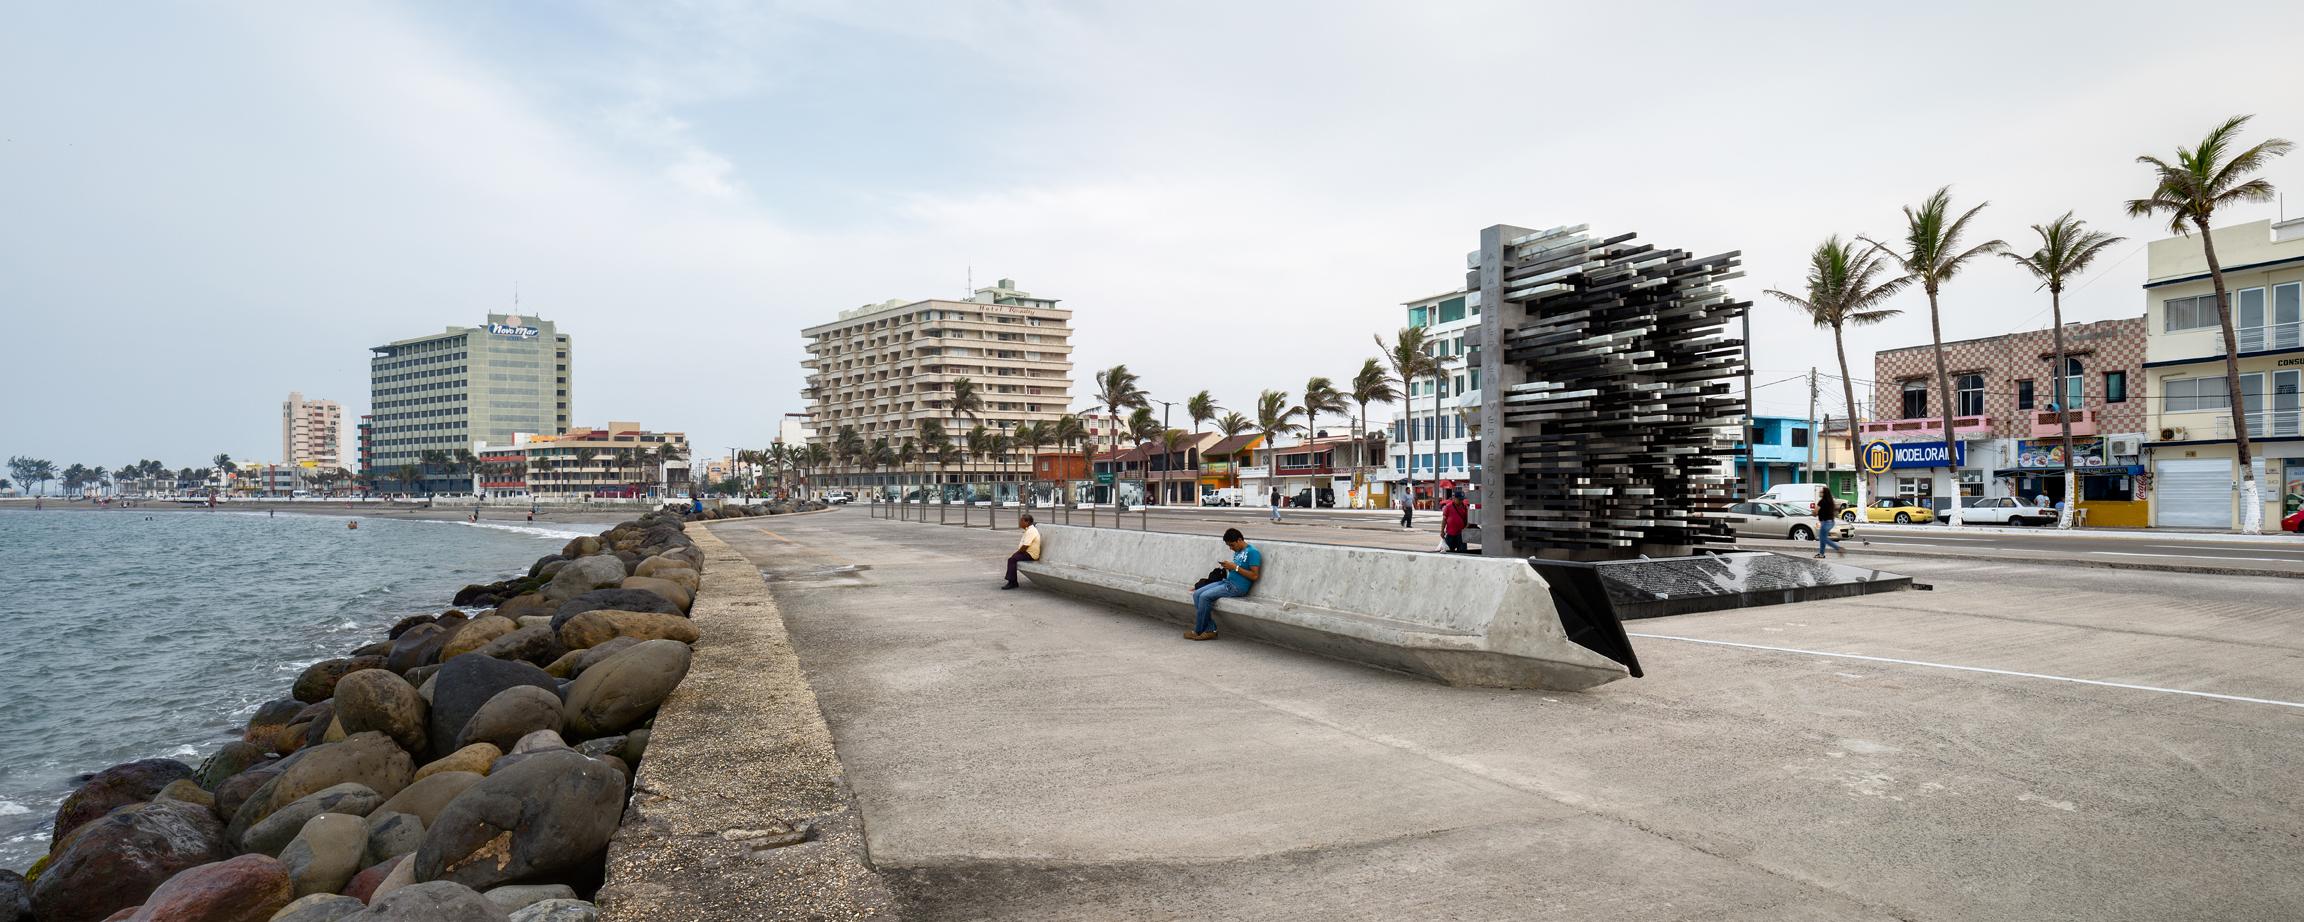 ARCHETONIC Monumento 04 - Jacobo Micha : commémoration à Veracruz